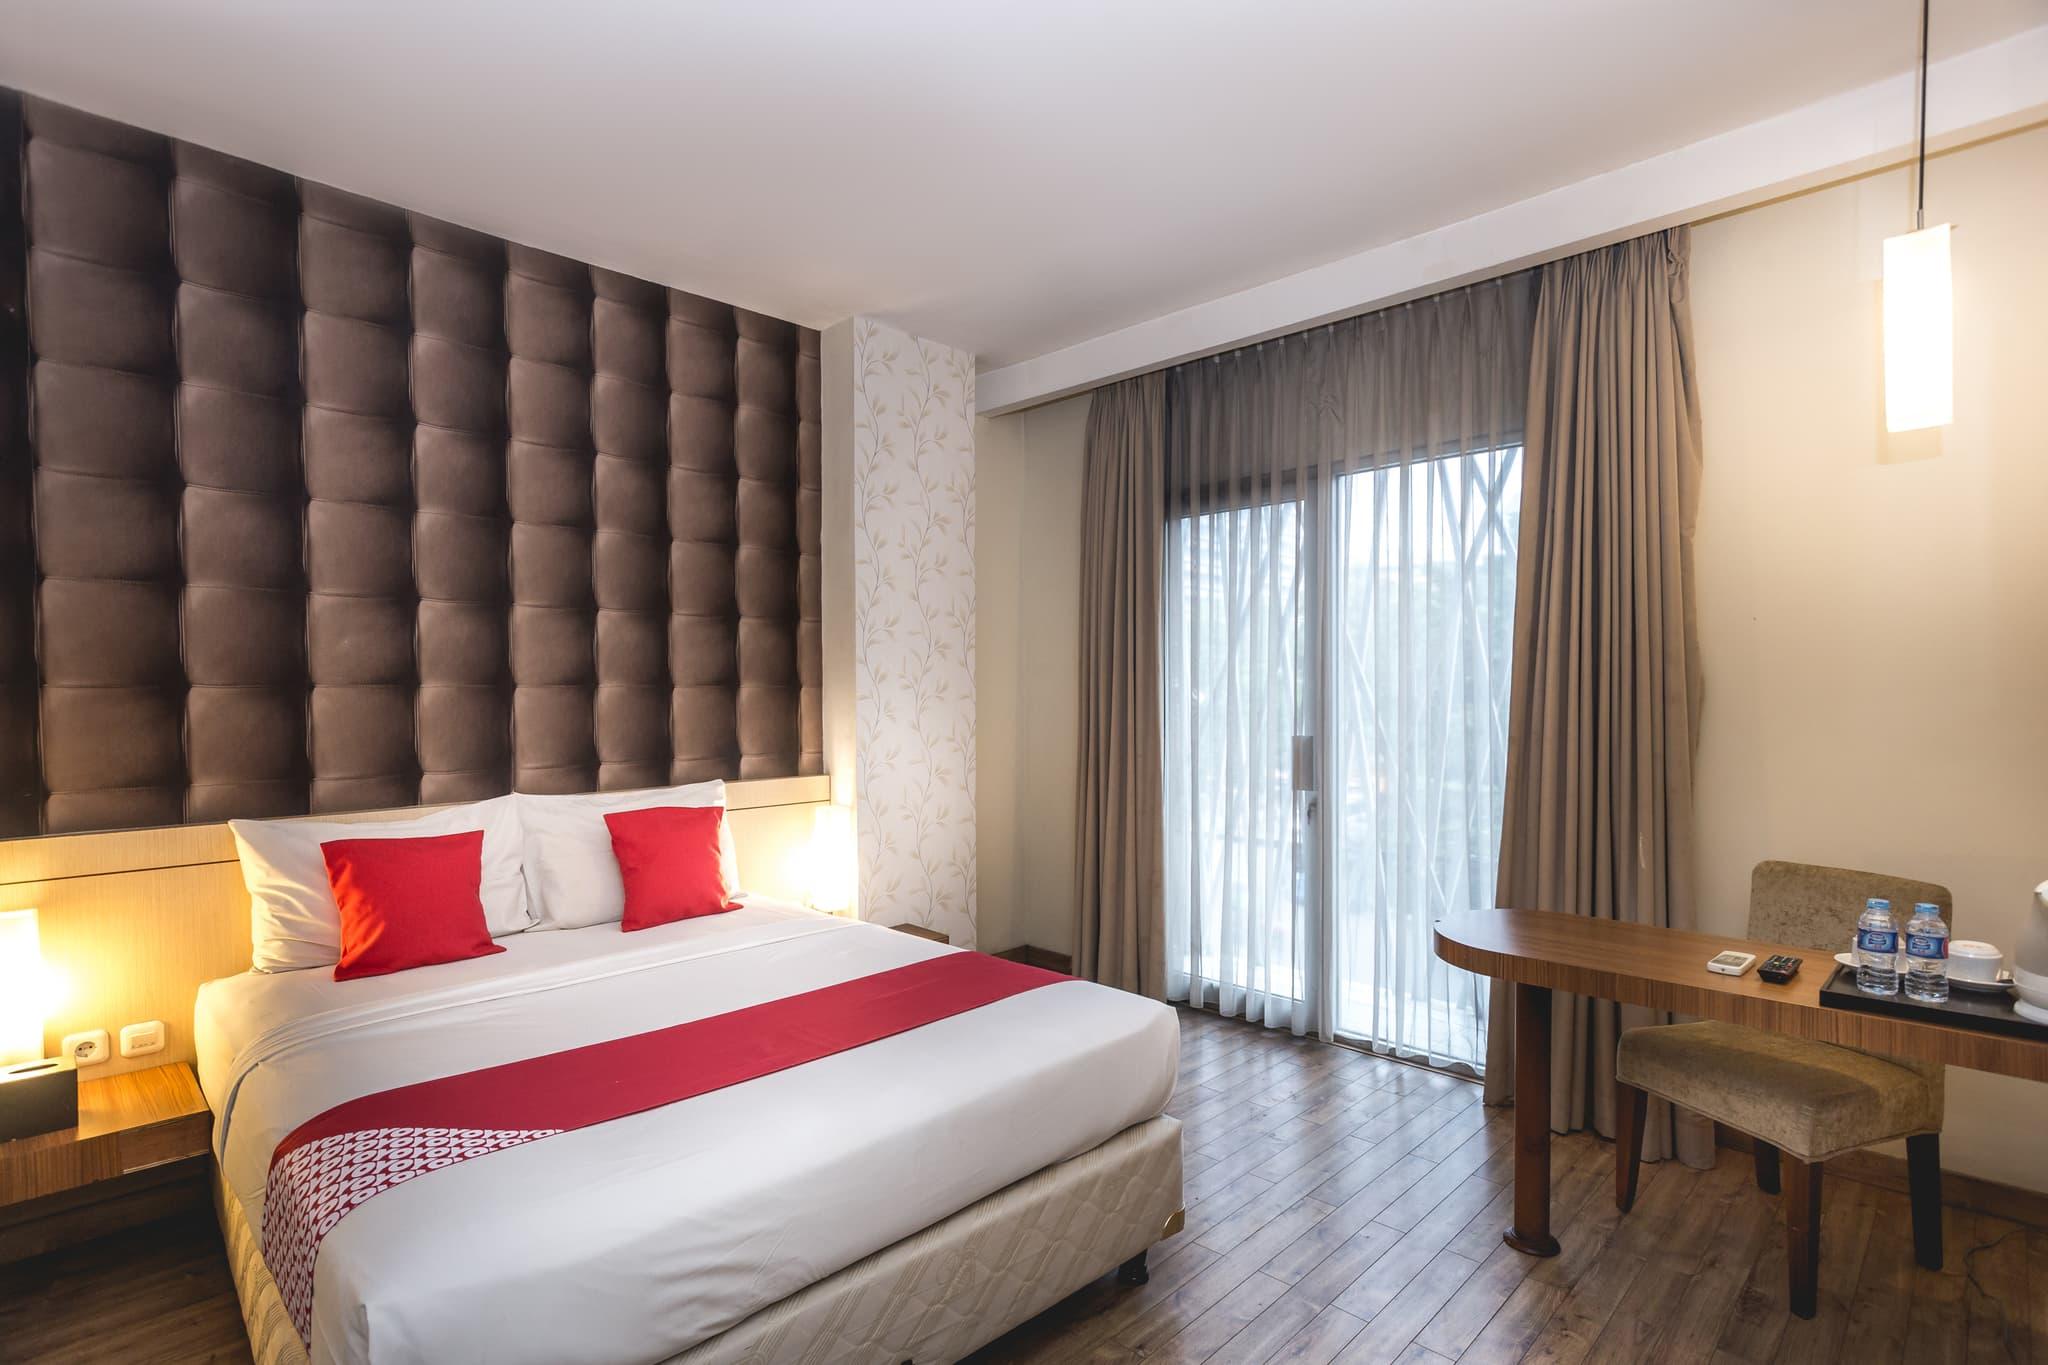 Voucher OYO Hotel Rp 135.000